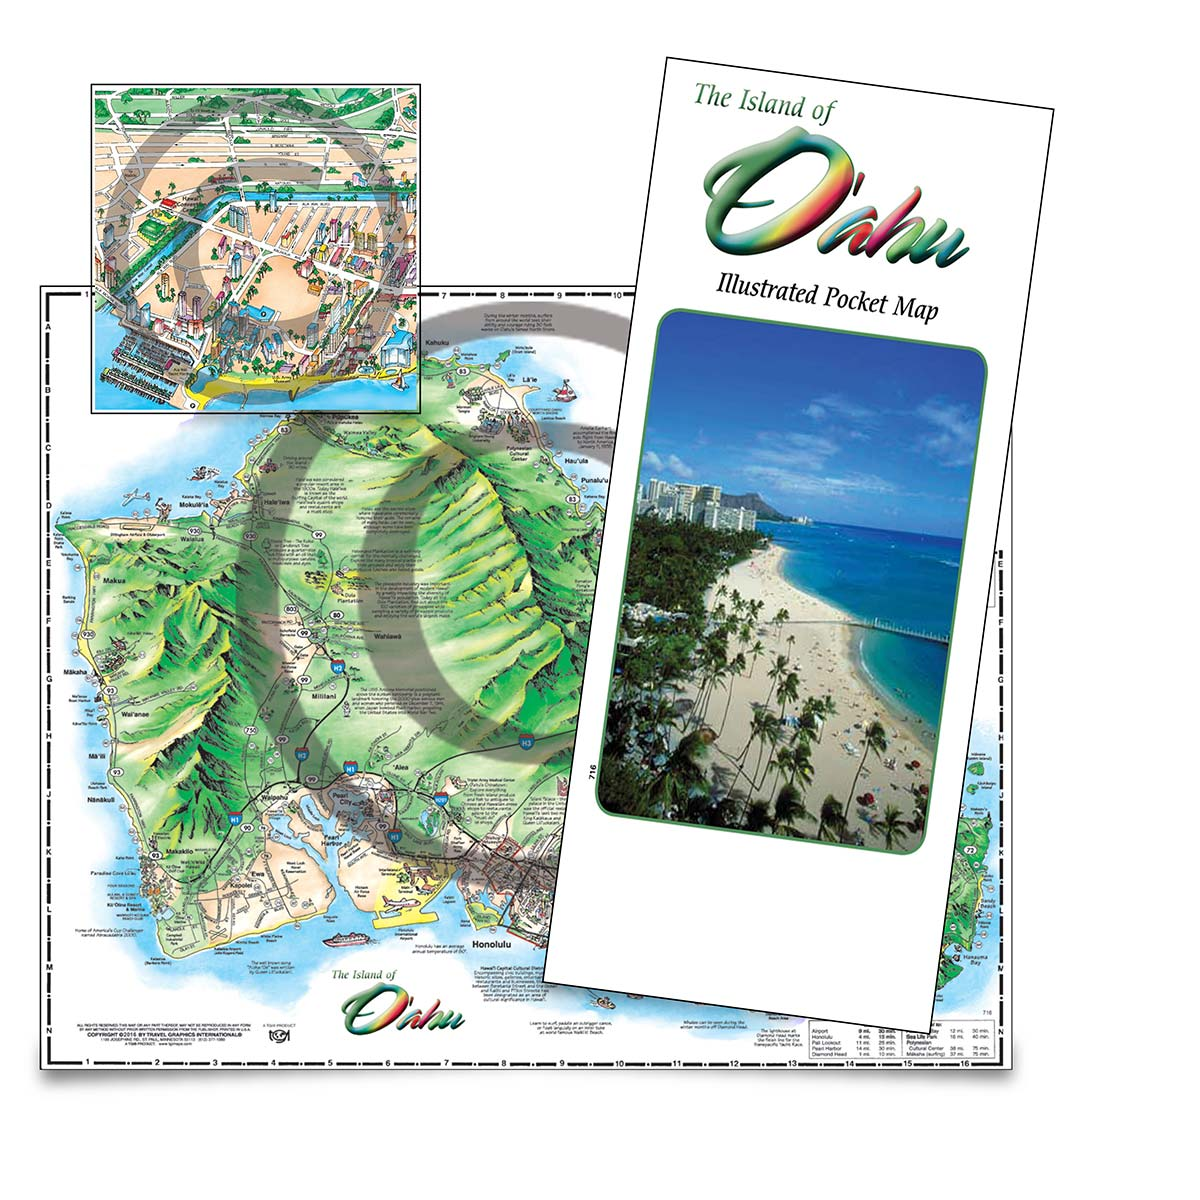 Oahu Pocket Map (English) on tahiti map, waikiki map, pearl harbor map, montana map, niihau map, hawaii map, south carolina map, colorado map, molokai map, honolulu map, haleiwa map, hanauma bay map, maui map, hilo map, kauai map, big island map, kahoolawe map, california map, kaneohe bay map, lanai map,